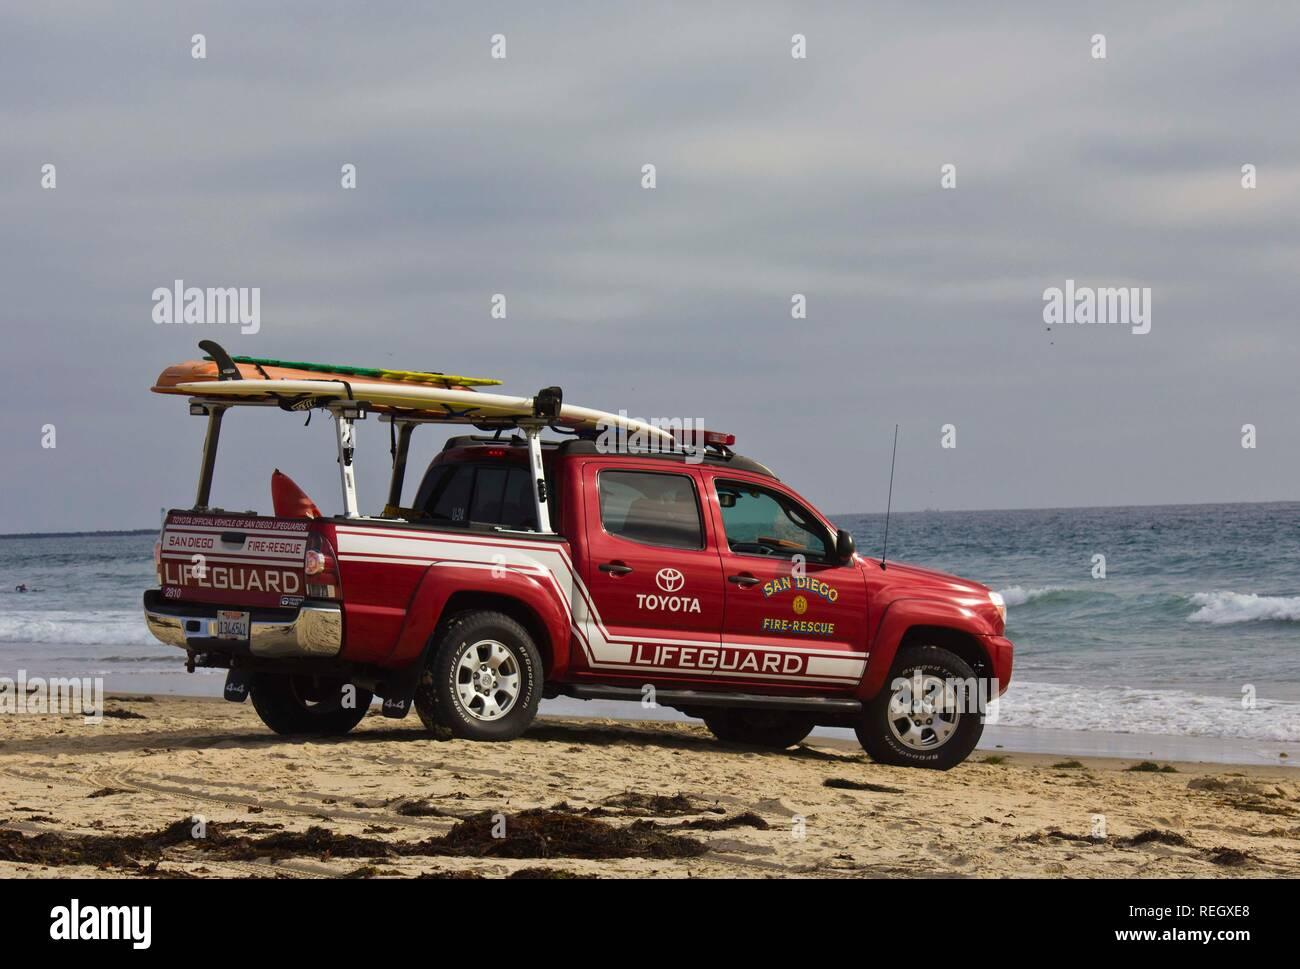 SAN DIEGO, USA - AUGUST 20 103: Toyota Lifeguard vehicle at